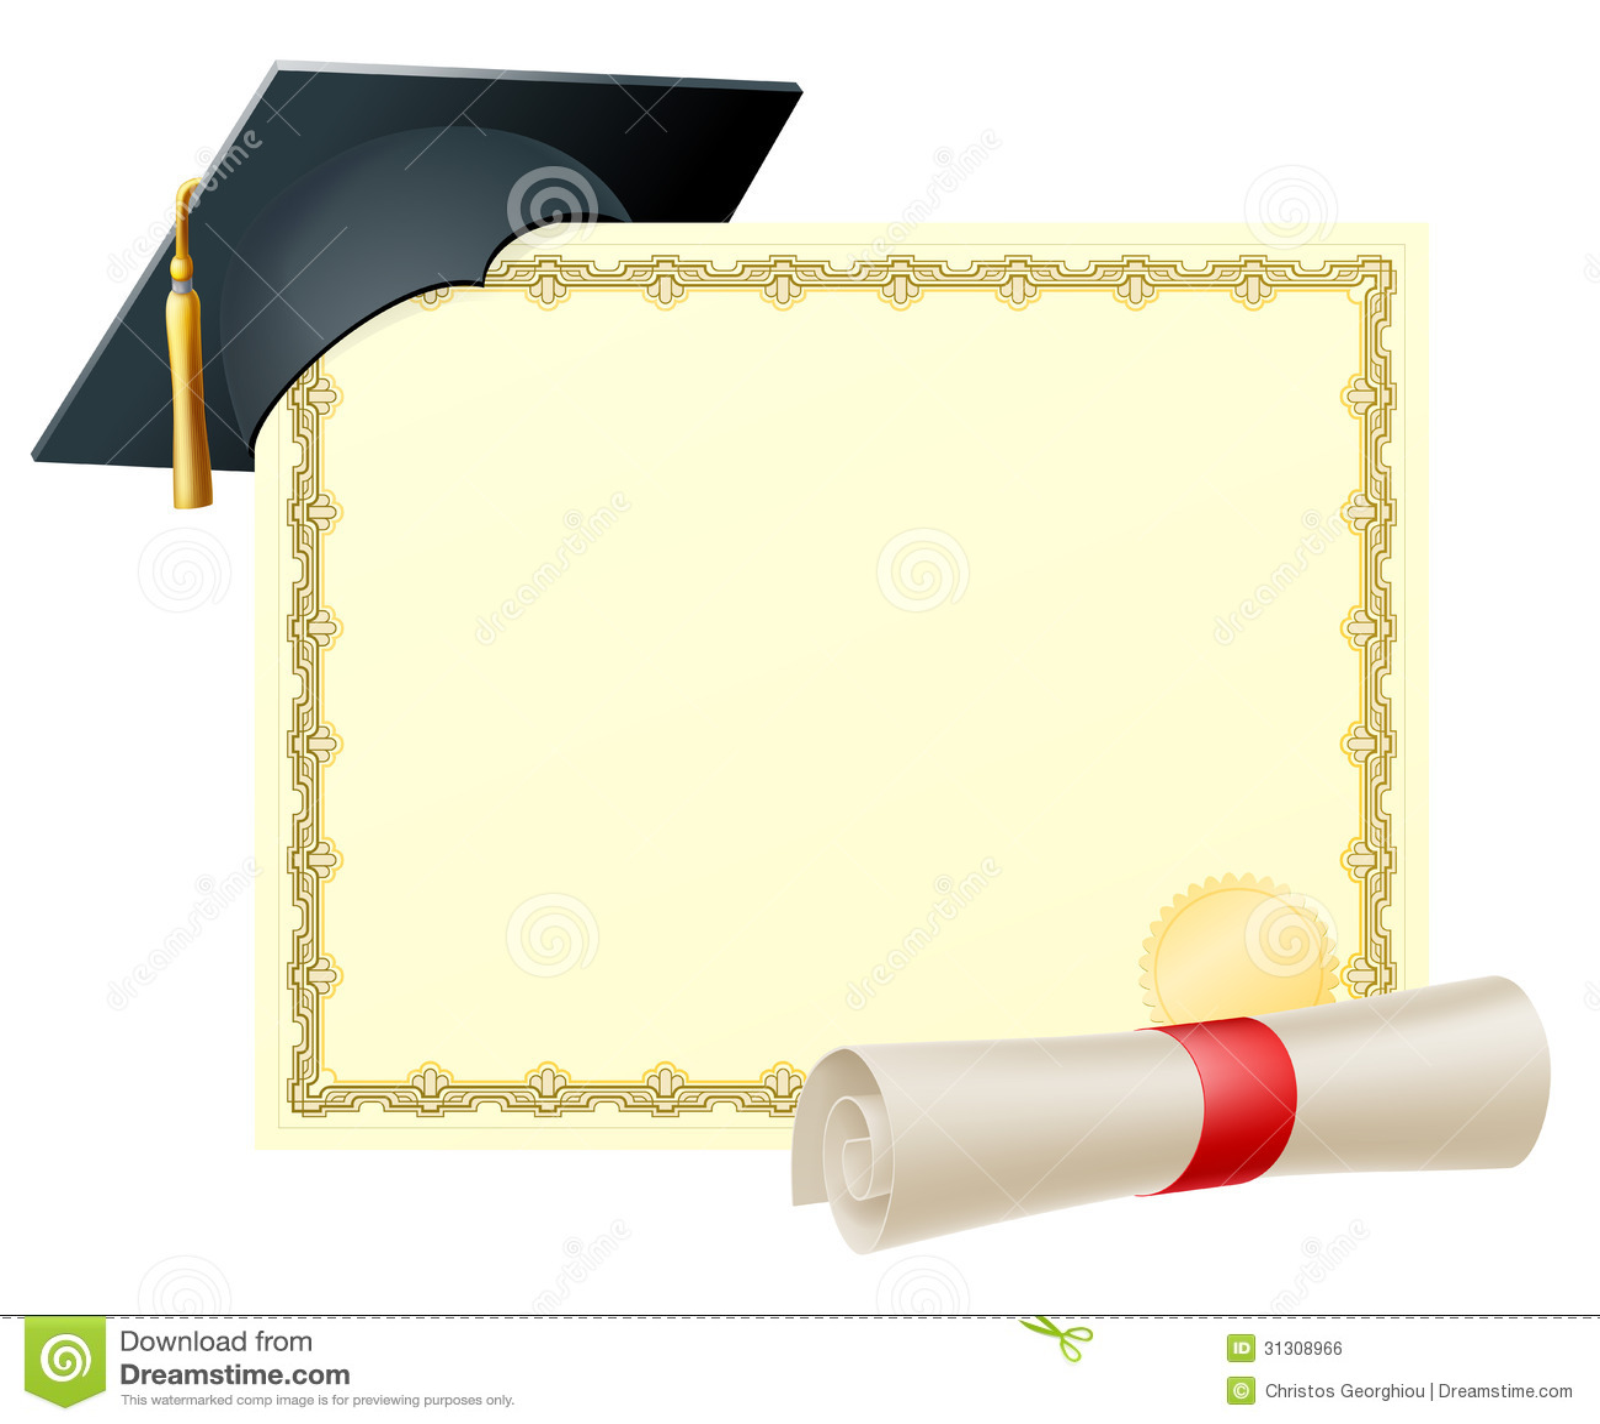 Graduation Cap With Diploma Car Interior Design